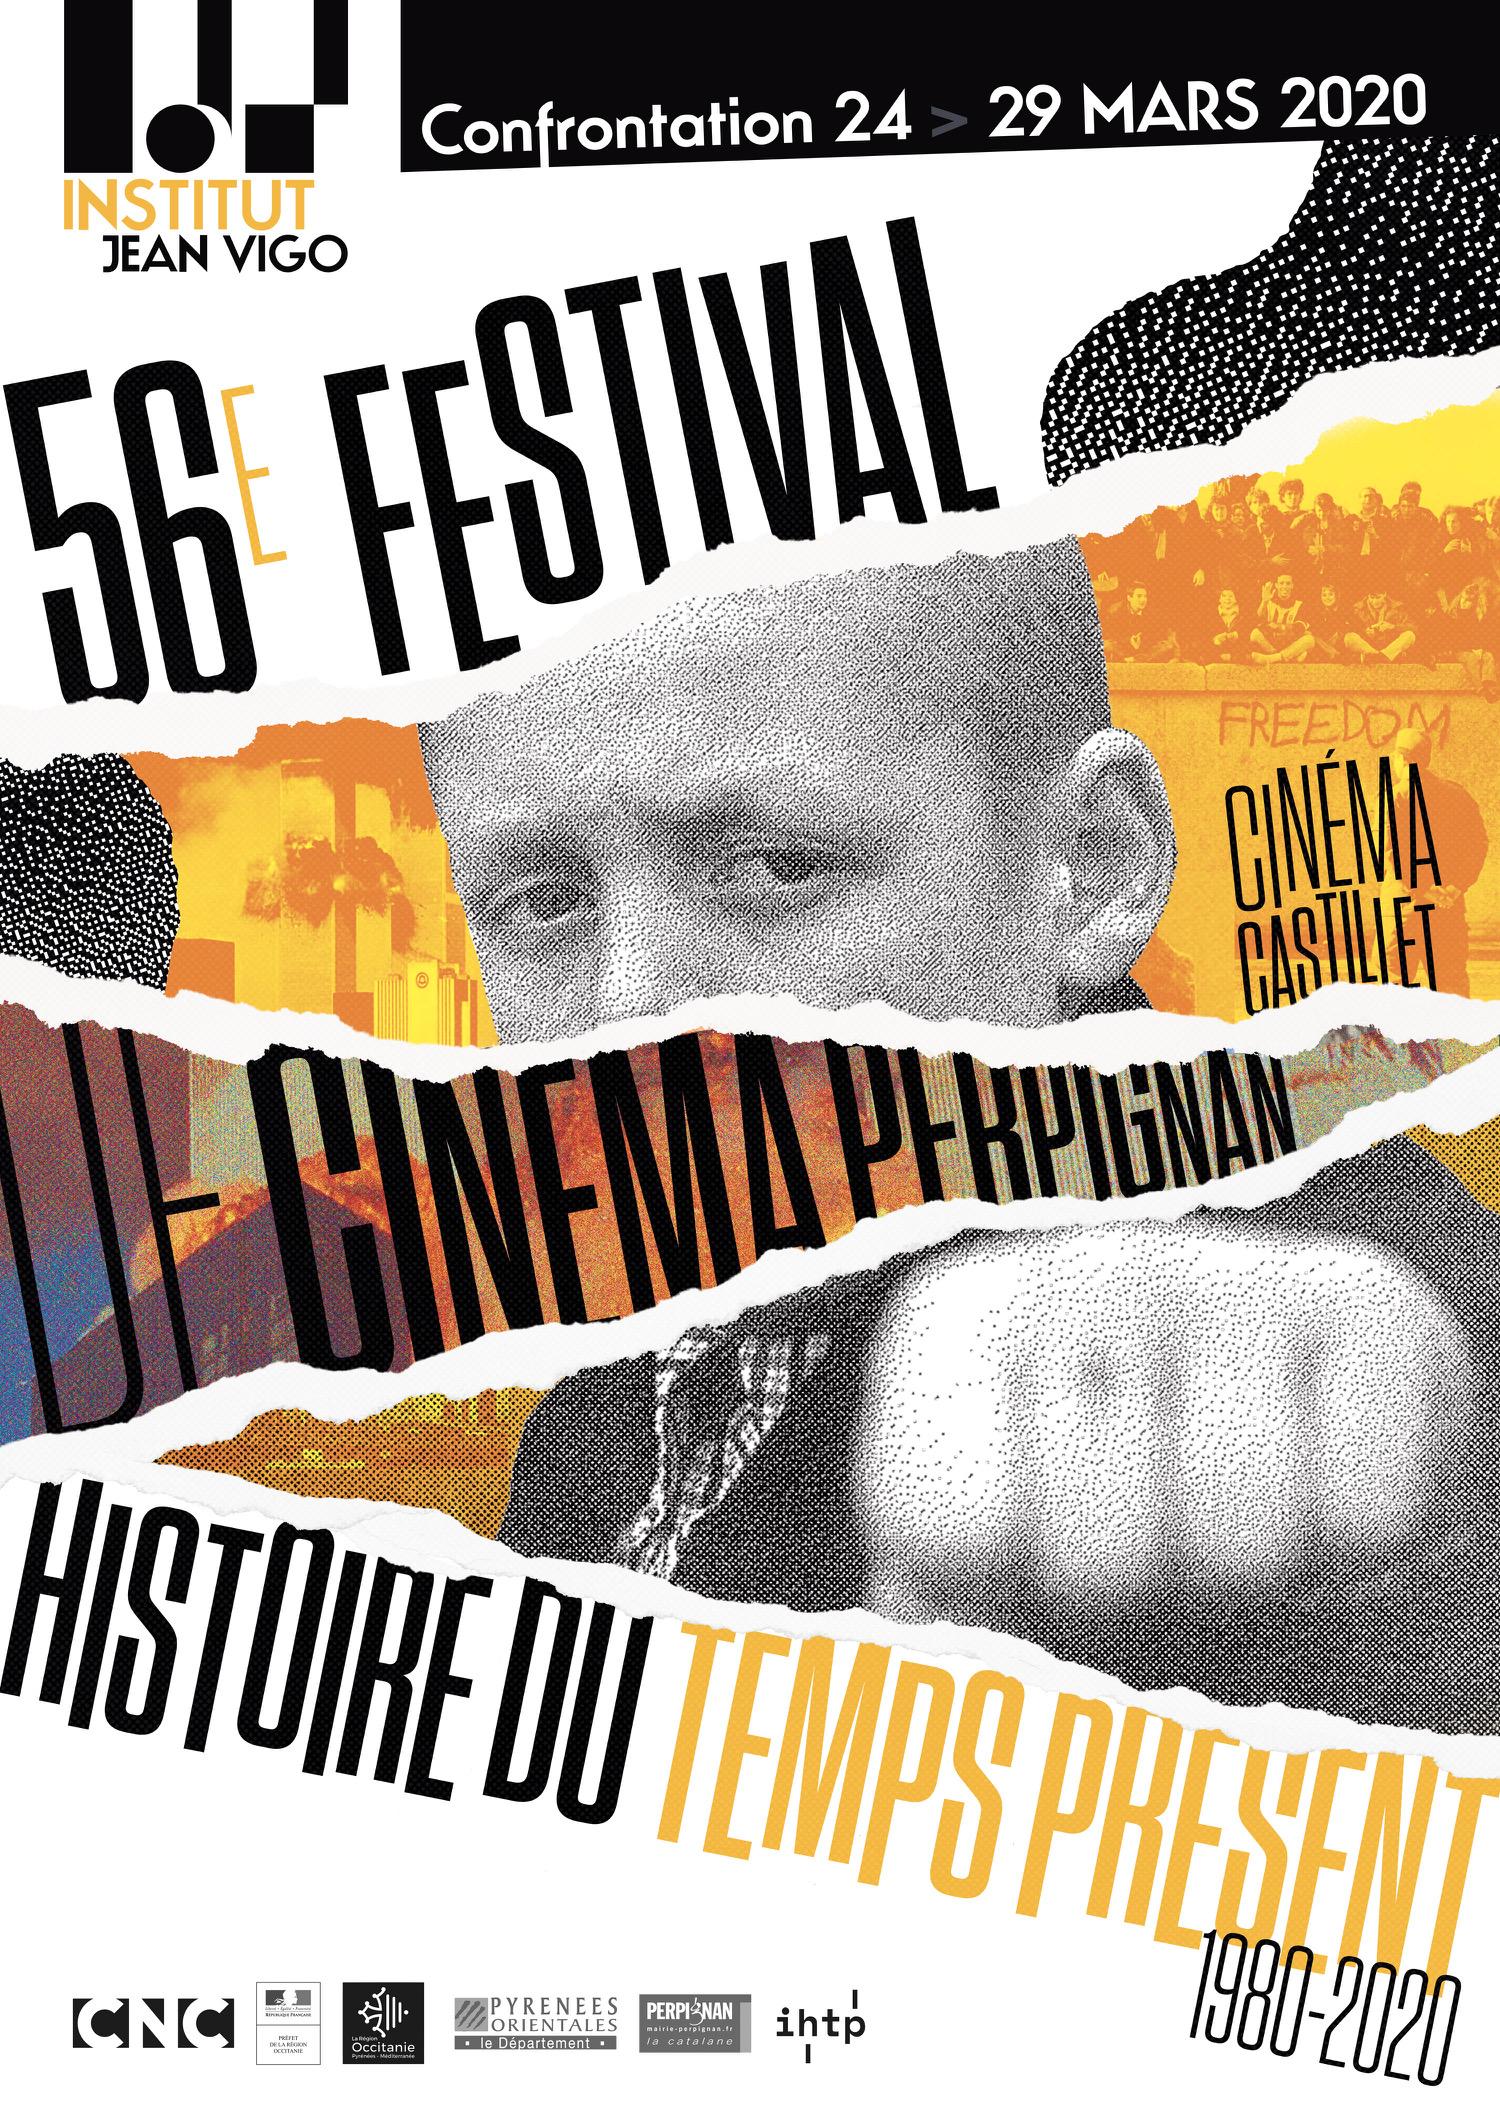 Confrontation 56 Affiche Institut Jean vigo